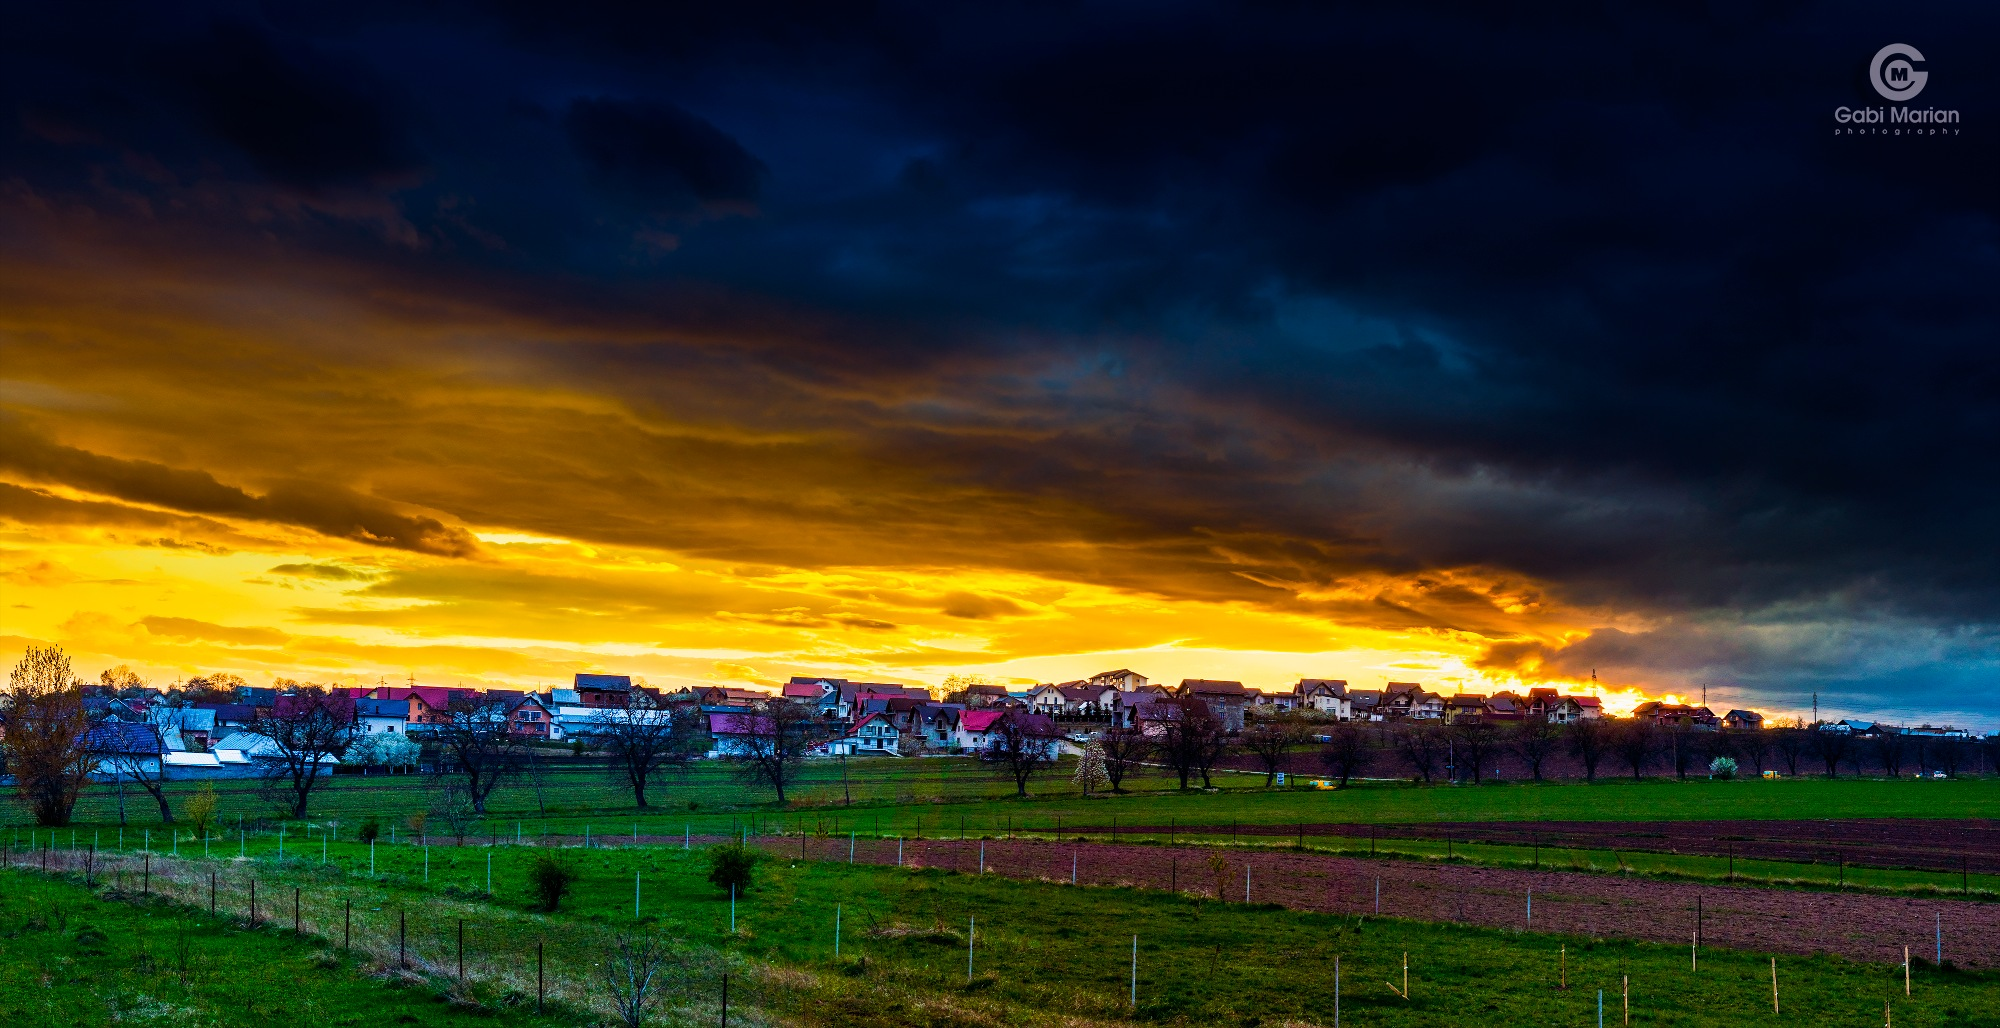 Sunset from the backyard by Gabi MARIAN